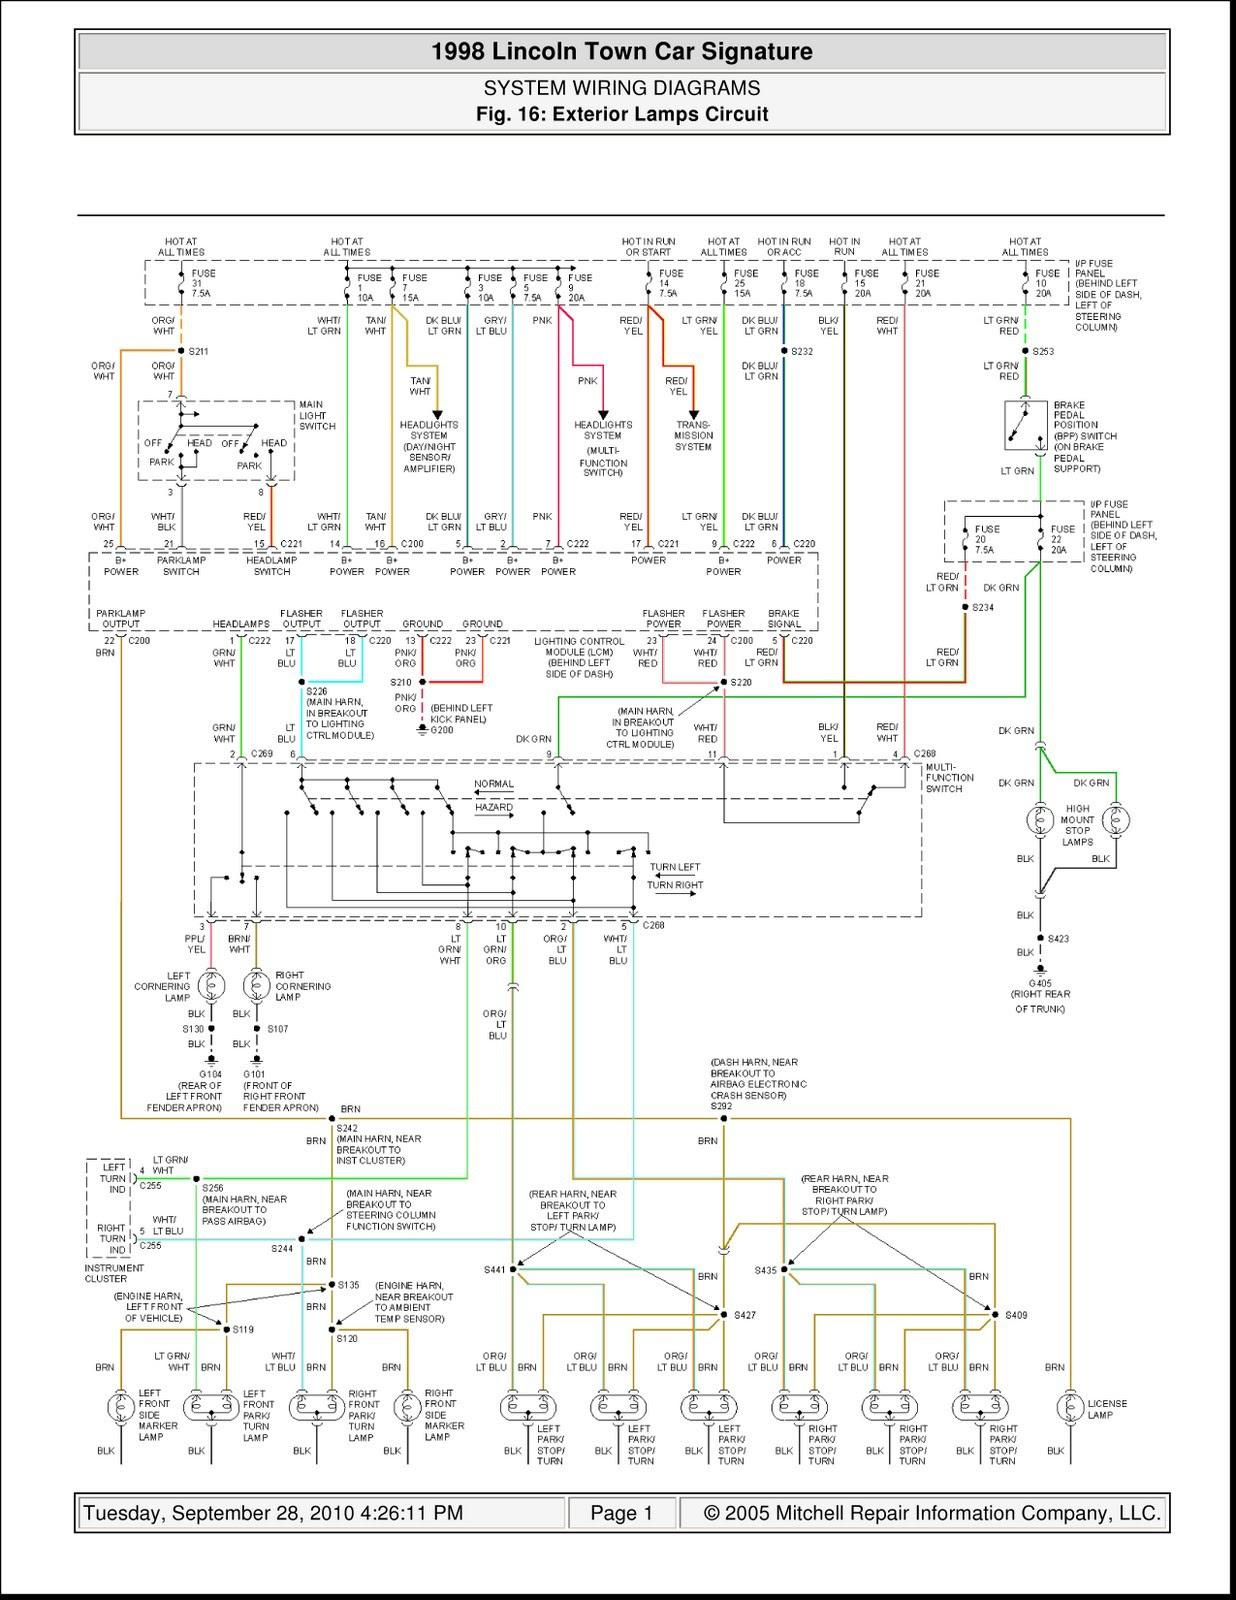 1997 Lincoln Continental Fuse Box Diagram - Wiring Diagram ...